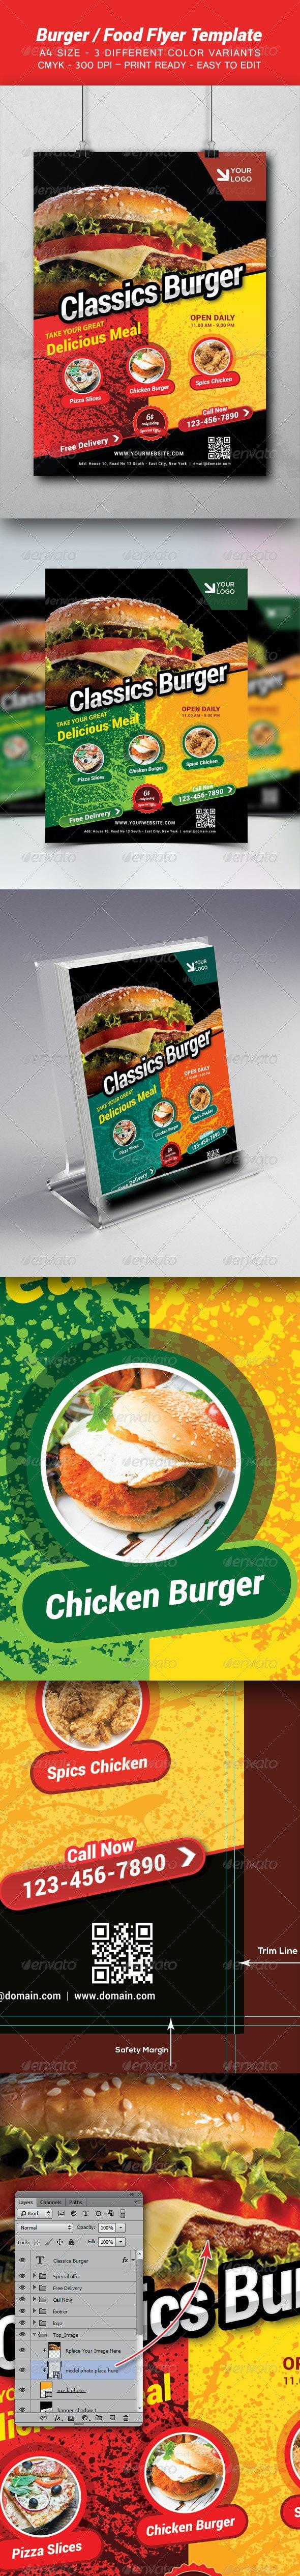 Burger / Food Template - Restaurant Flyers